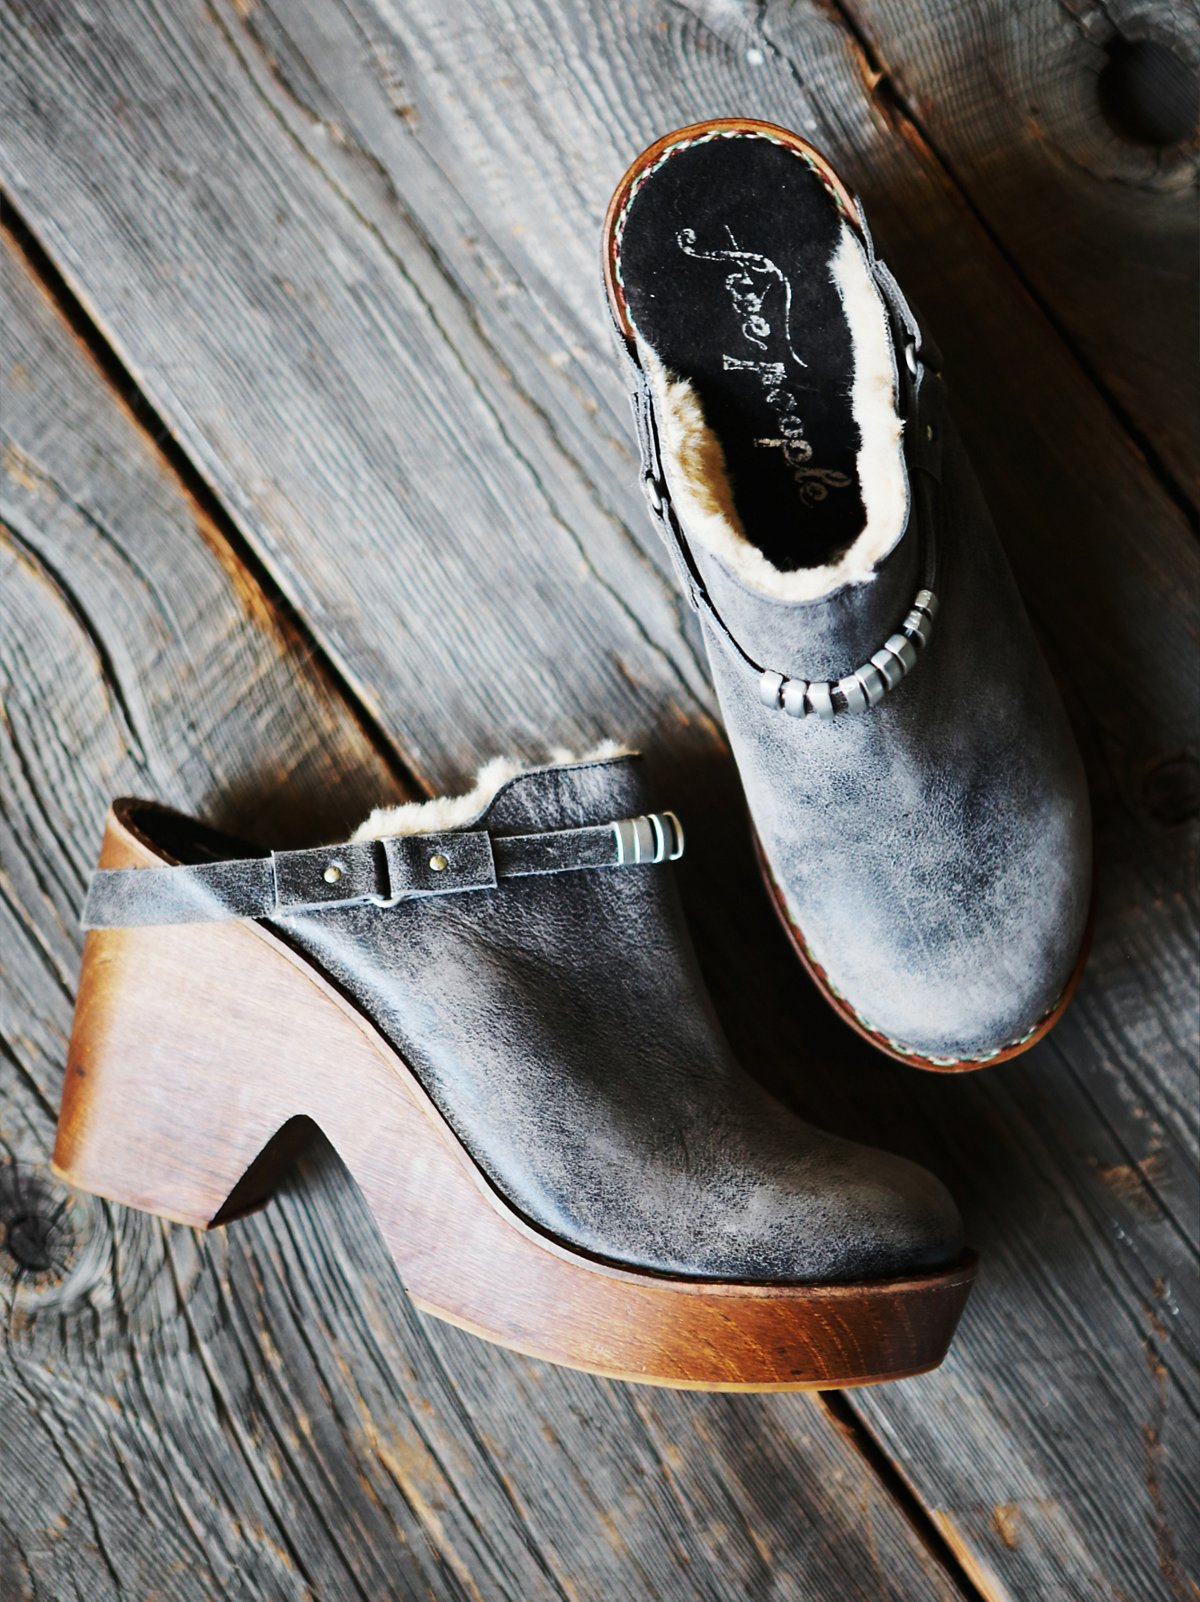 Premier懒人木底鞋